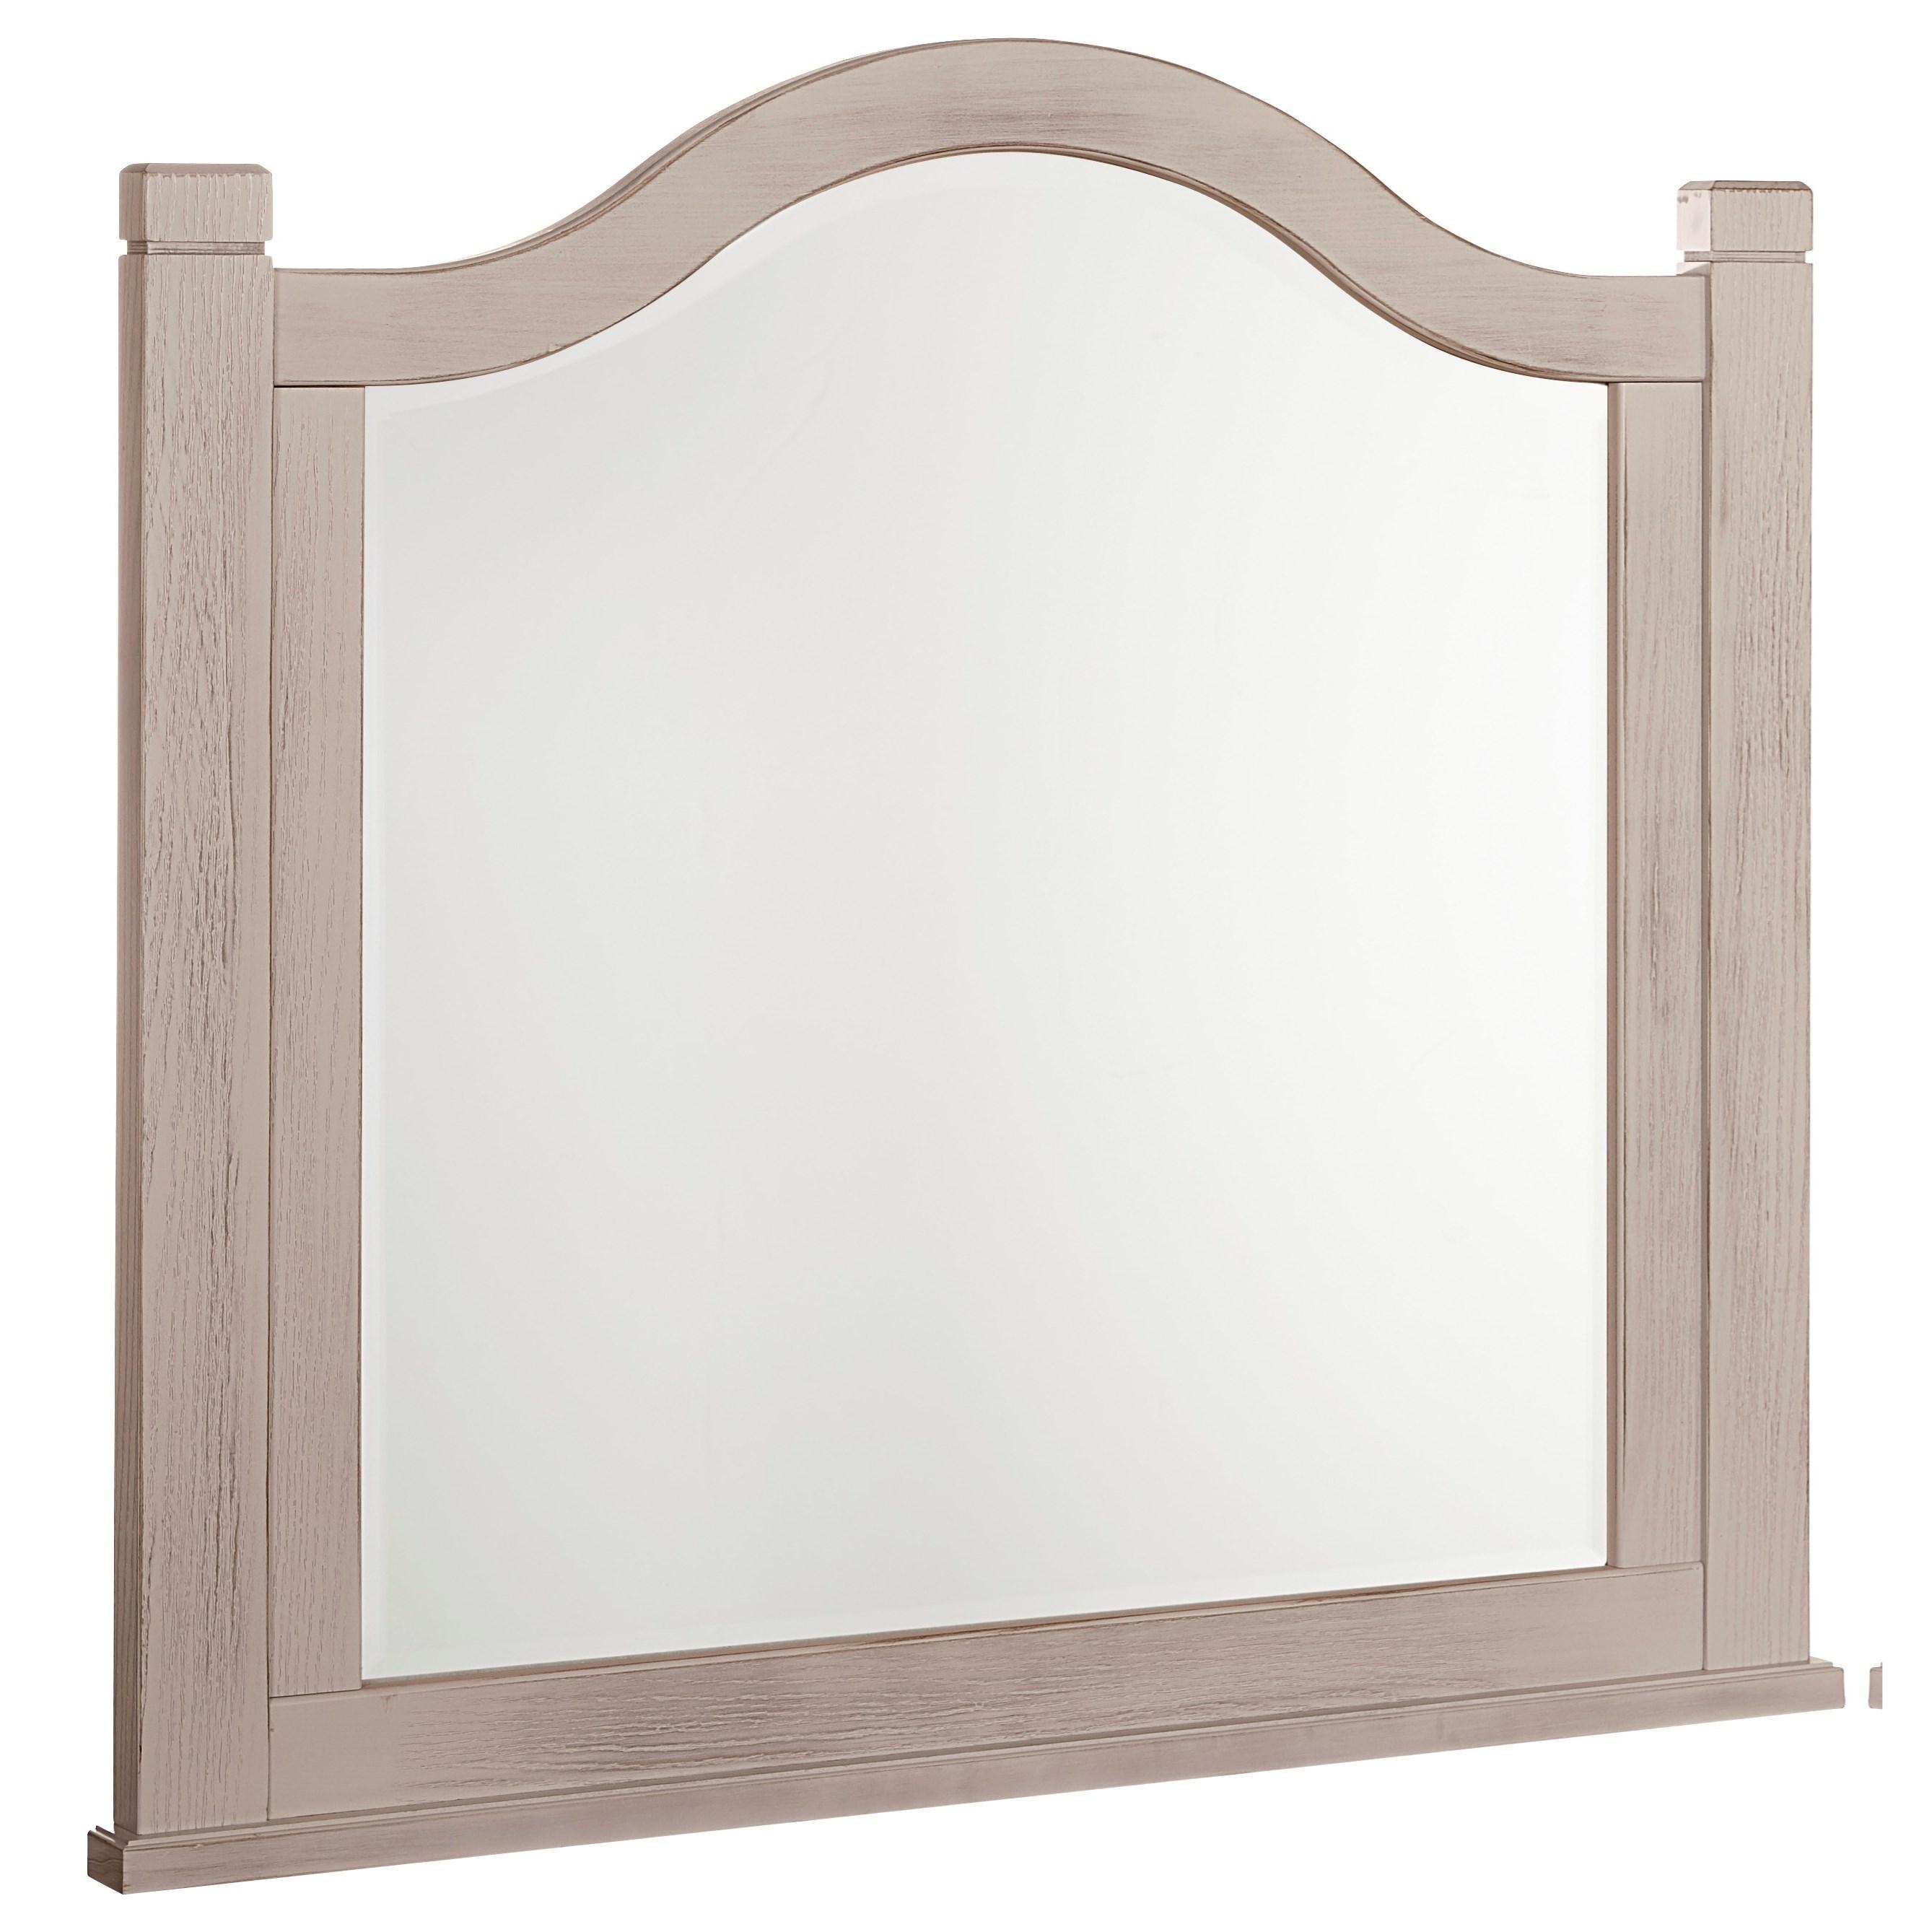 Transitional Master Arch Mirror